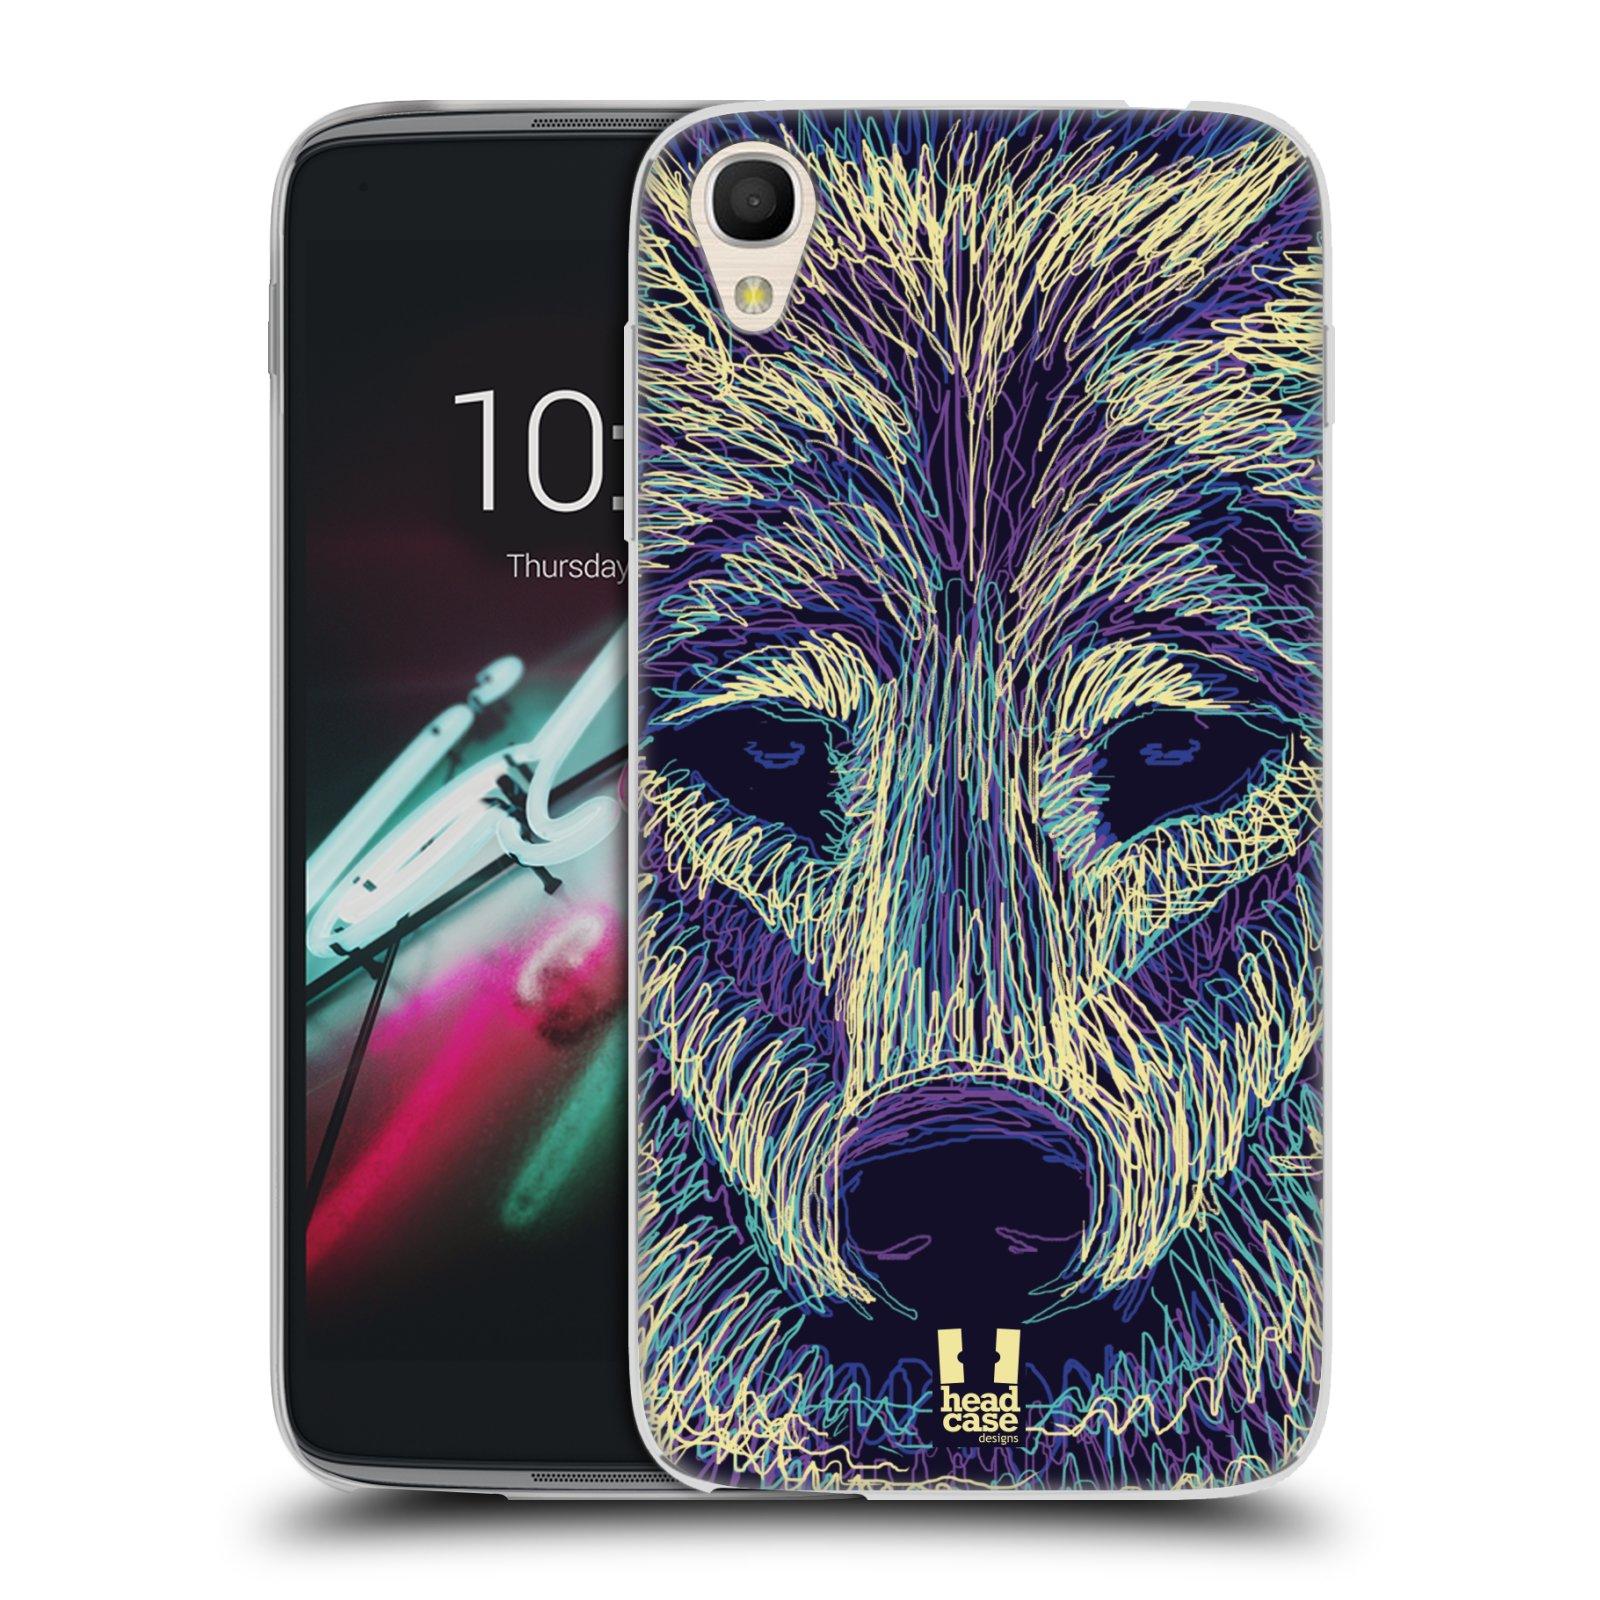 HEAD CASE silikonový obal na mobil Alcatel Idol 3 OT-6039Y (4.7) vzor zvíře čmáranice vlk